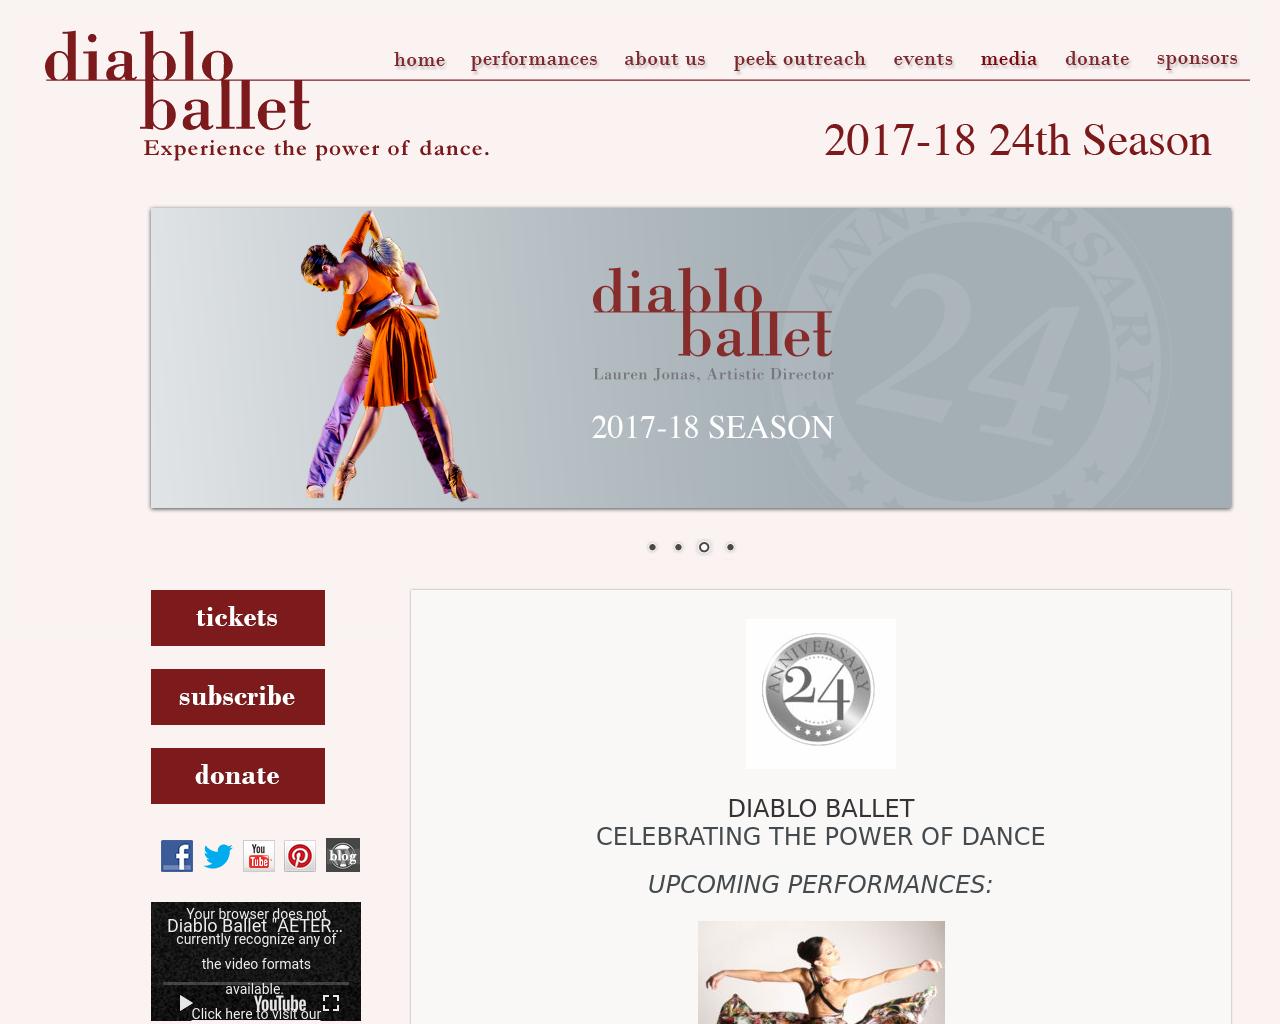 Diablo-Ballet-Advertising-Reviews-Pricing